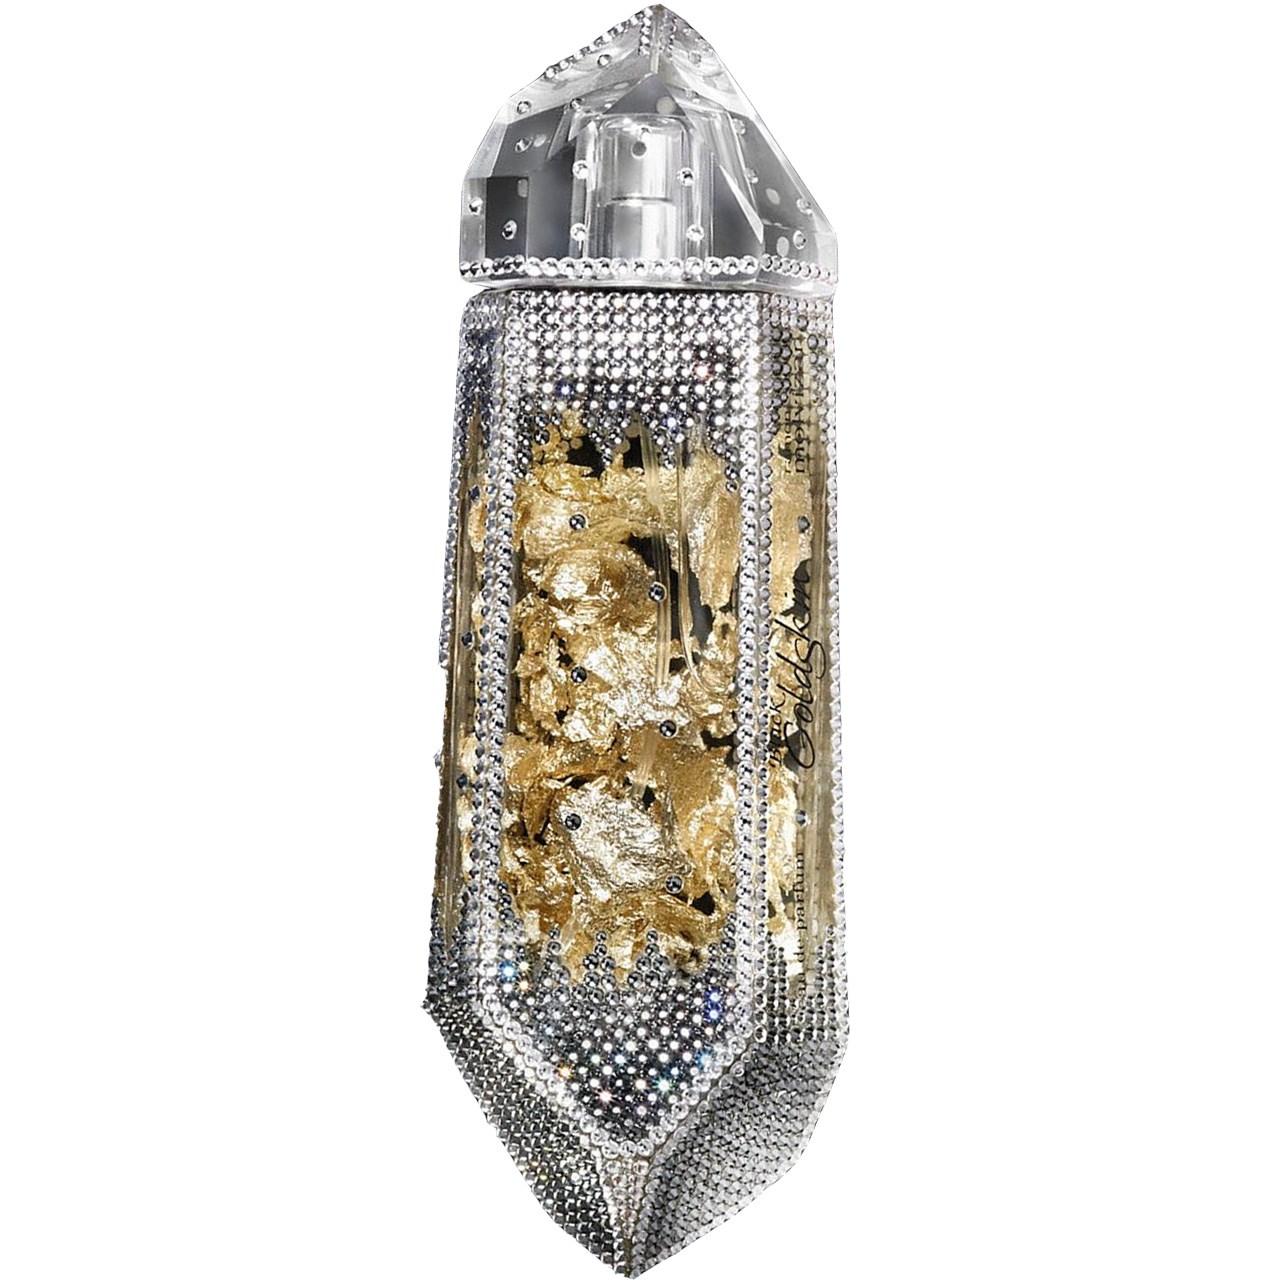 ادو پرفیوم رامون مولویزار مدل Black Goldskin Diamond حجم 100 میلی لیتر